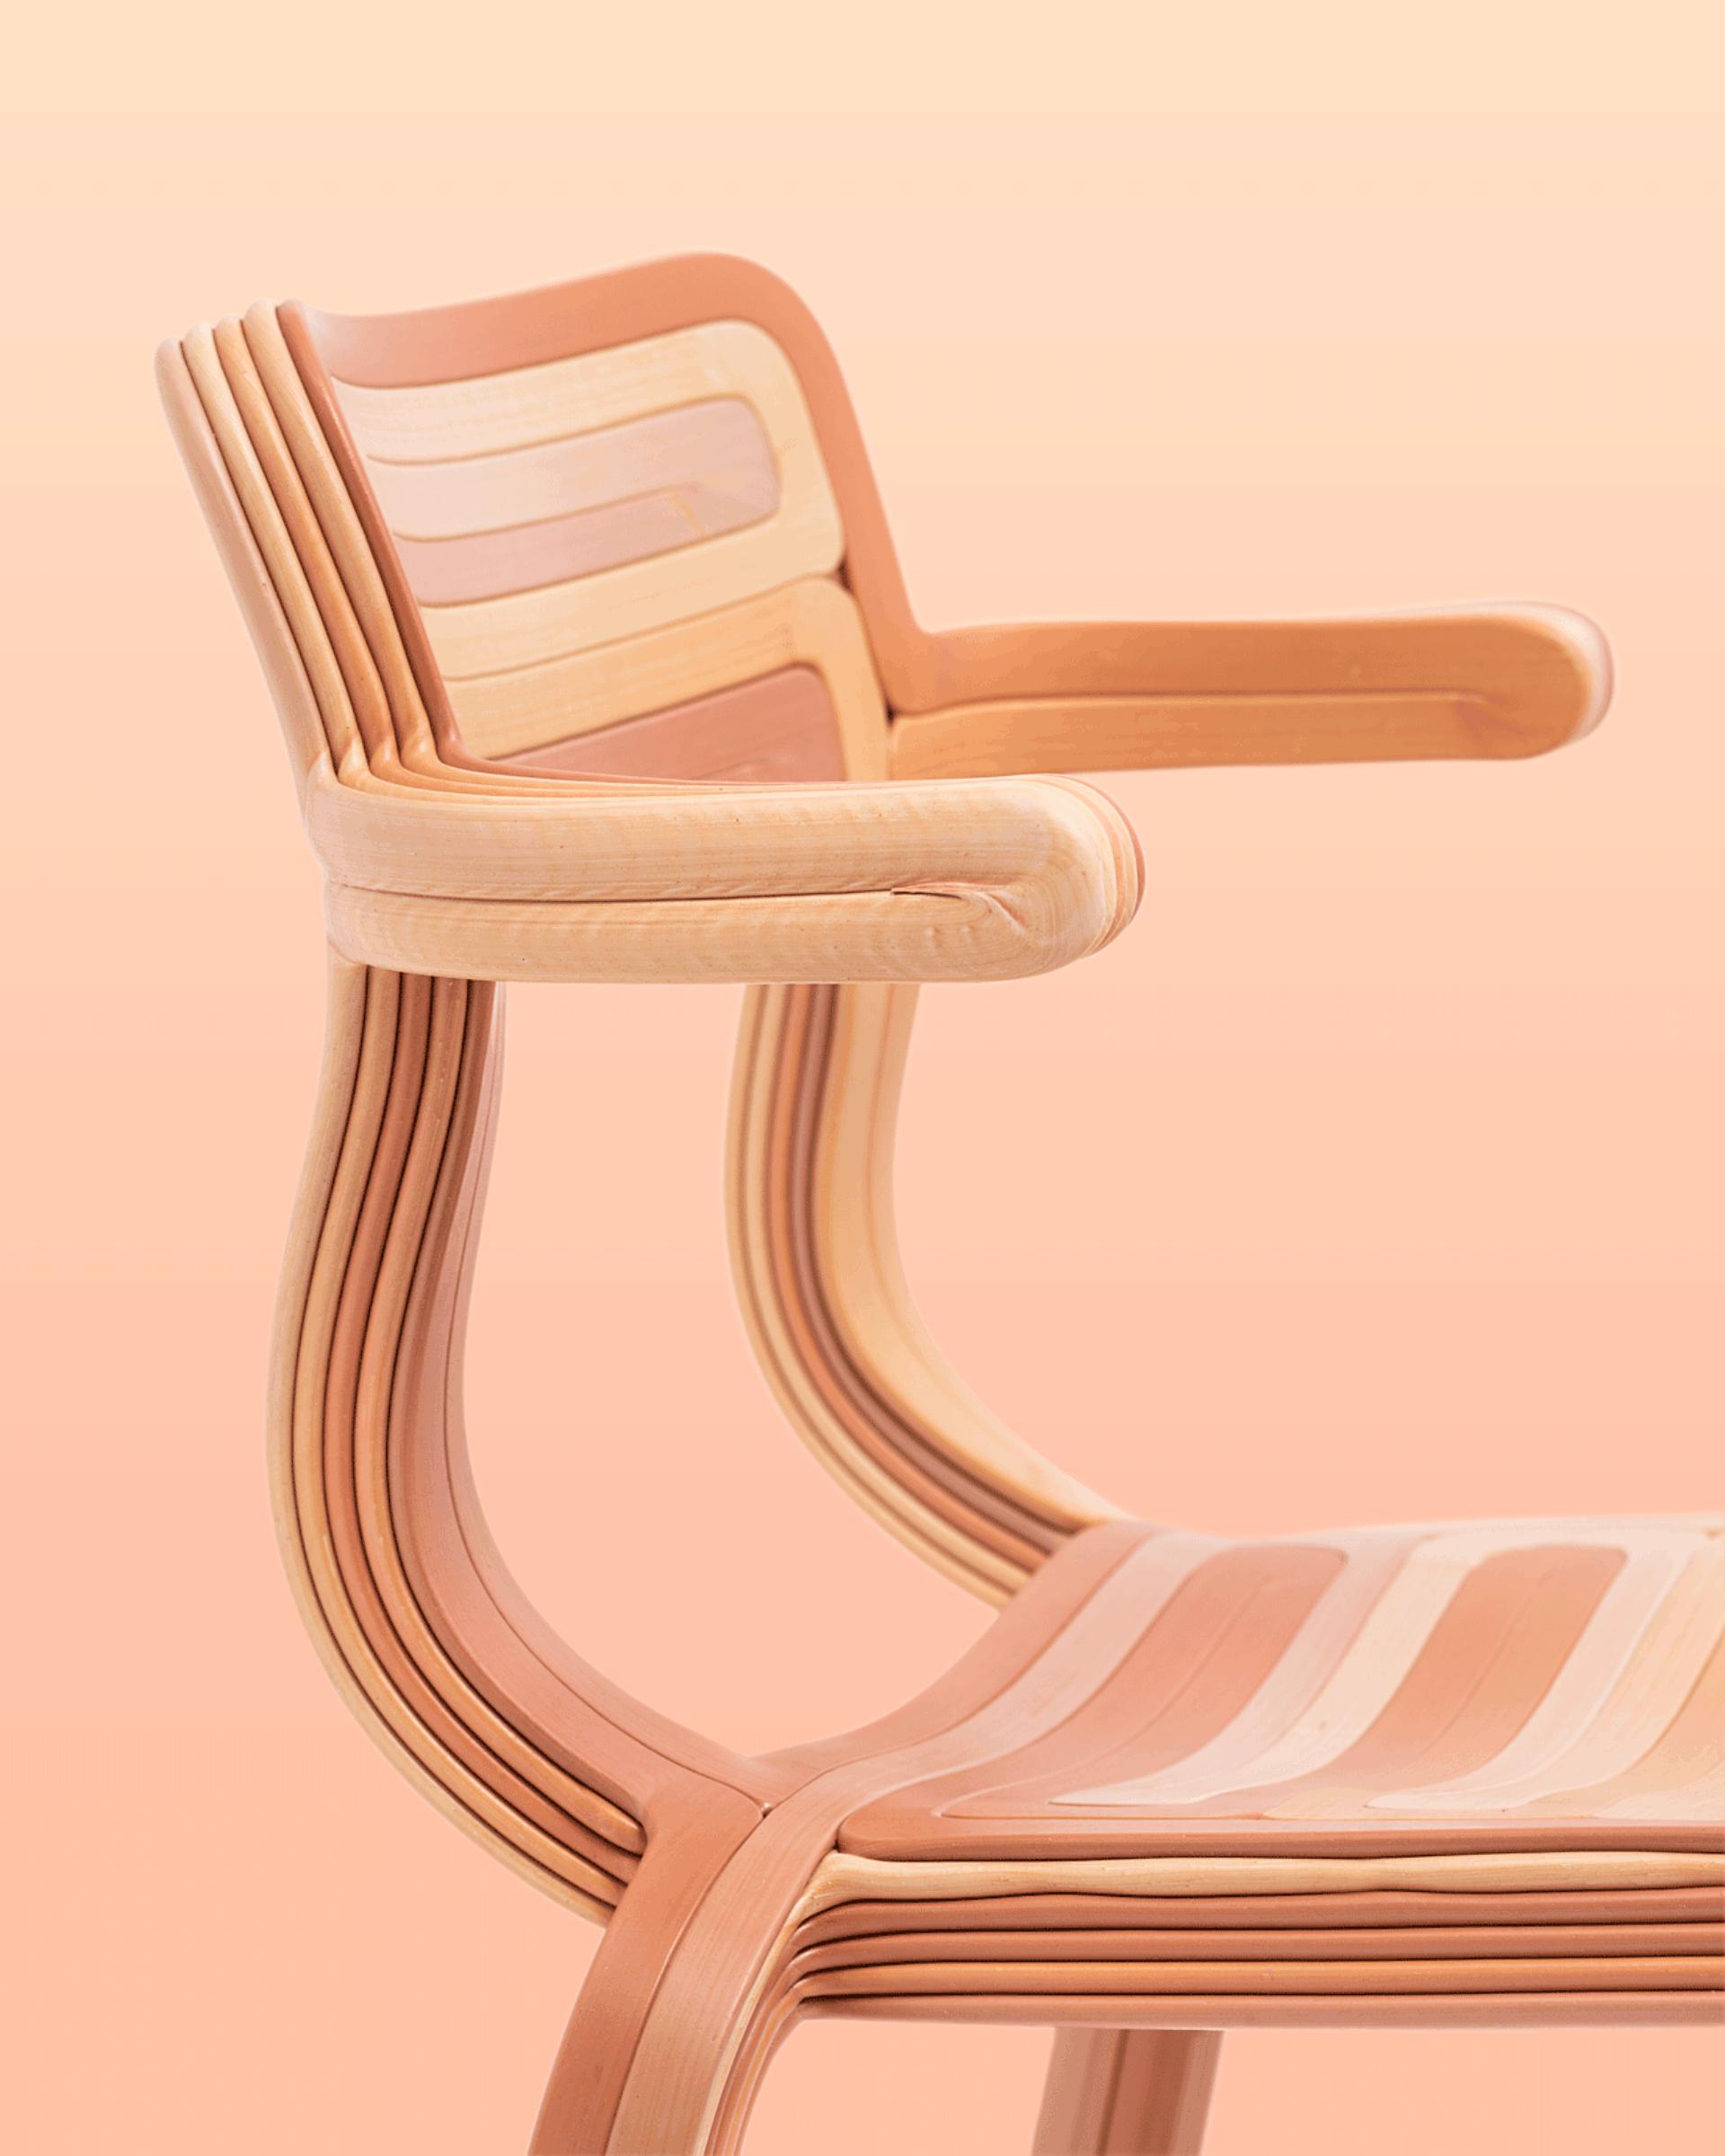 KOOIJ RVR Chair